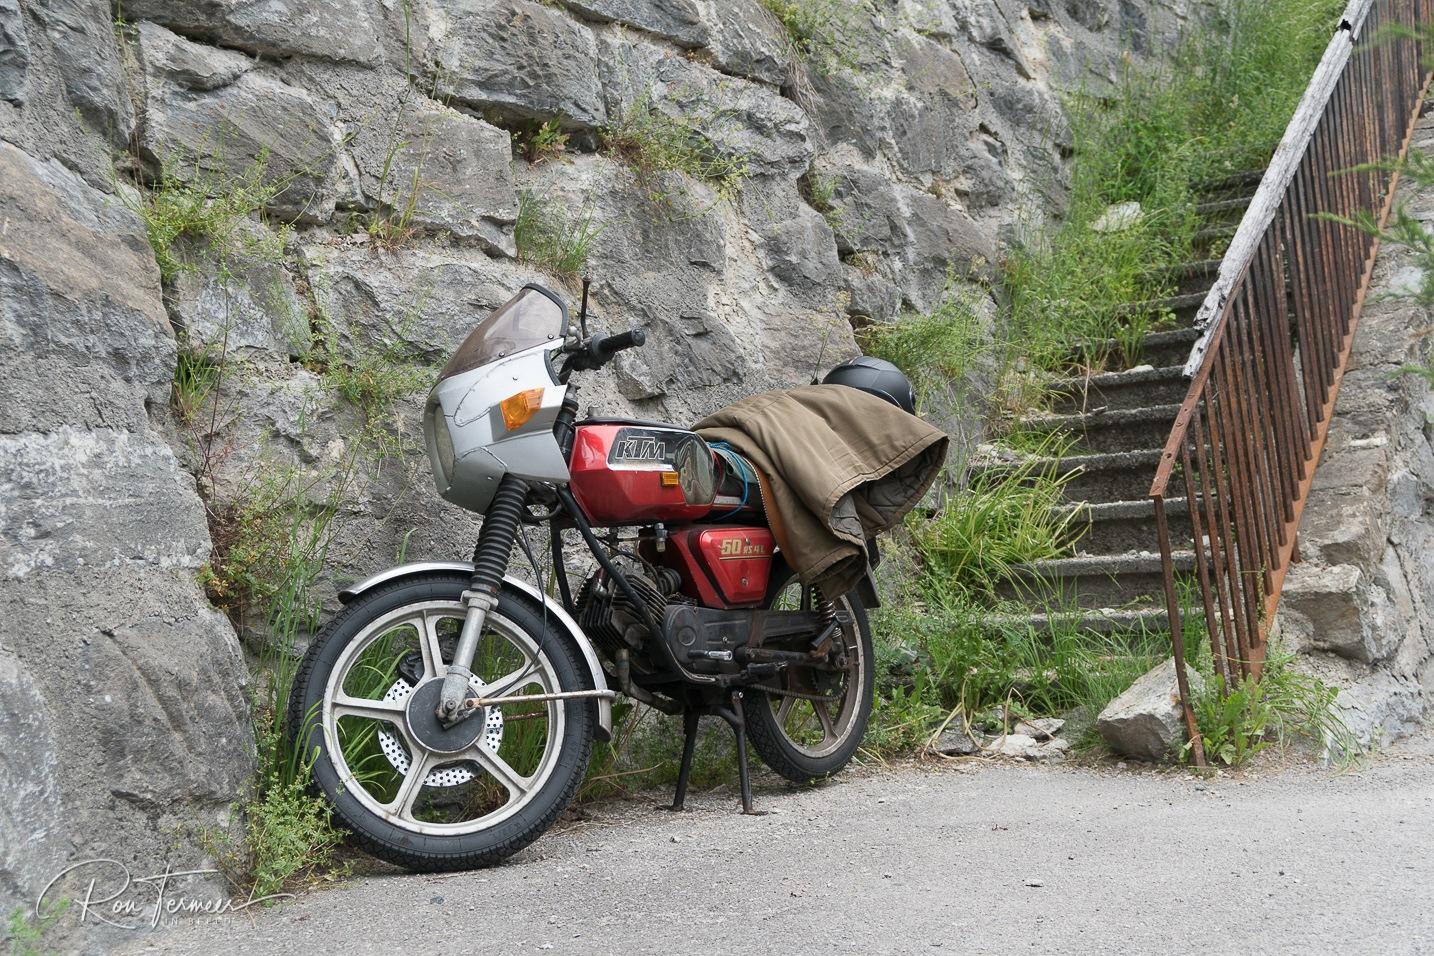 KTM moped by Ron Termeer